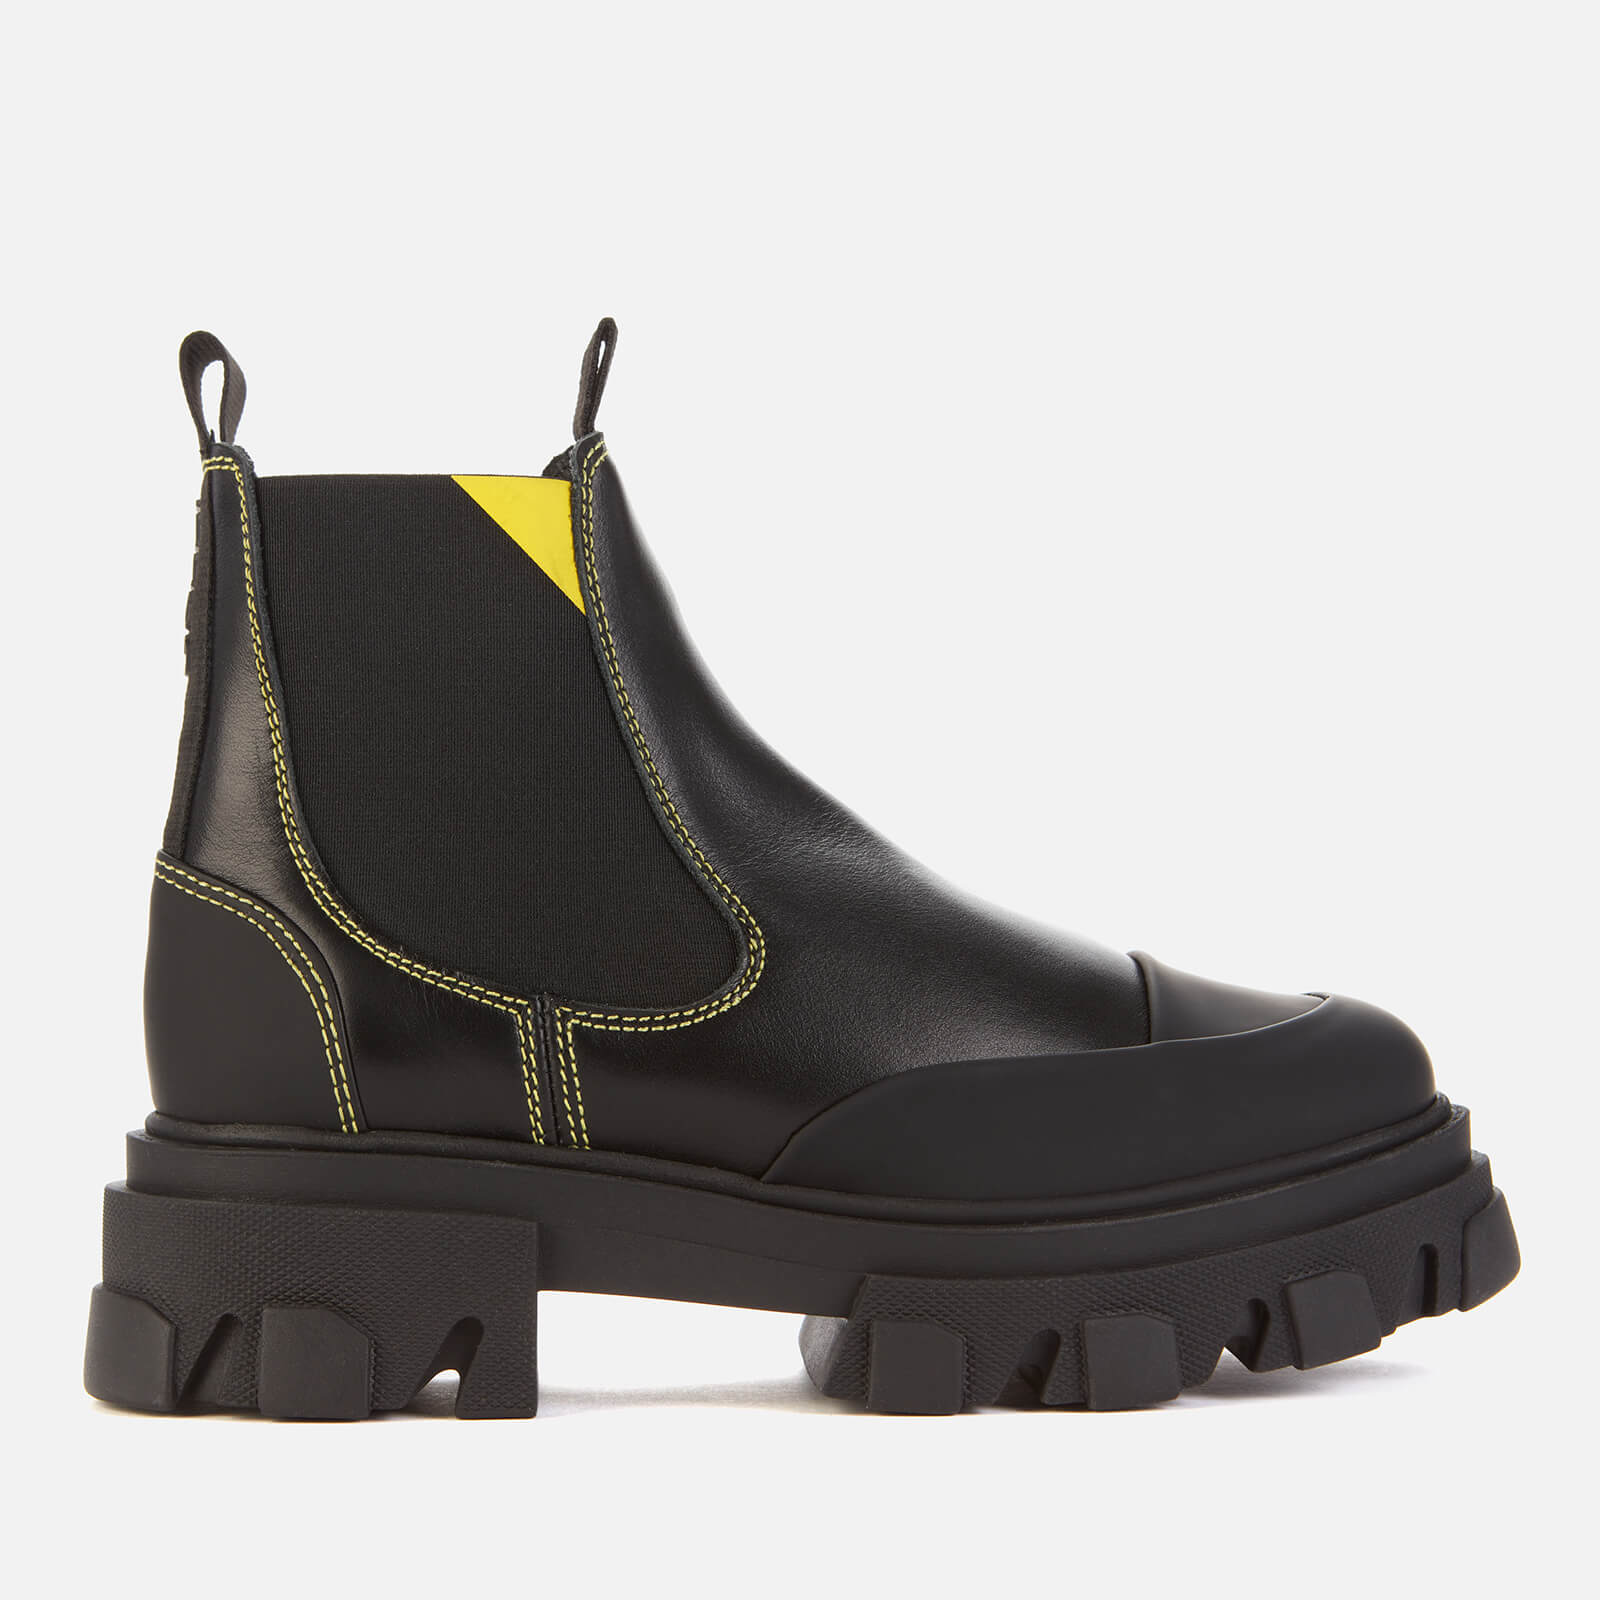 Ganni Women's Leather Chelsea Boots - Black - Uk 3